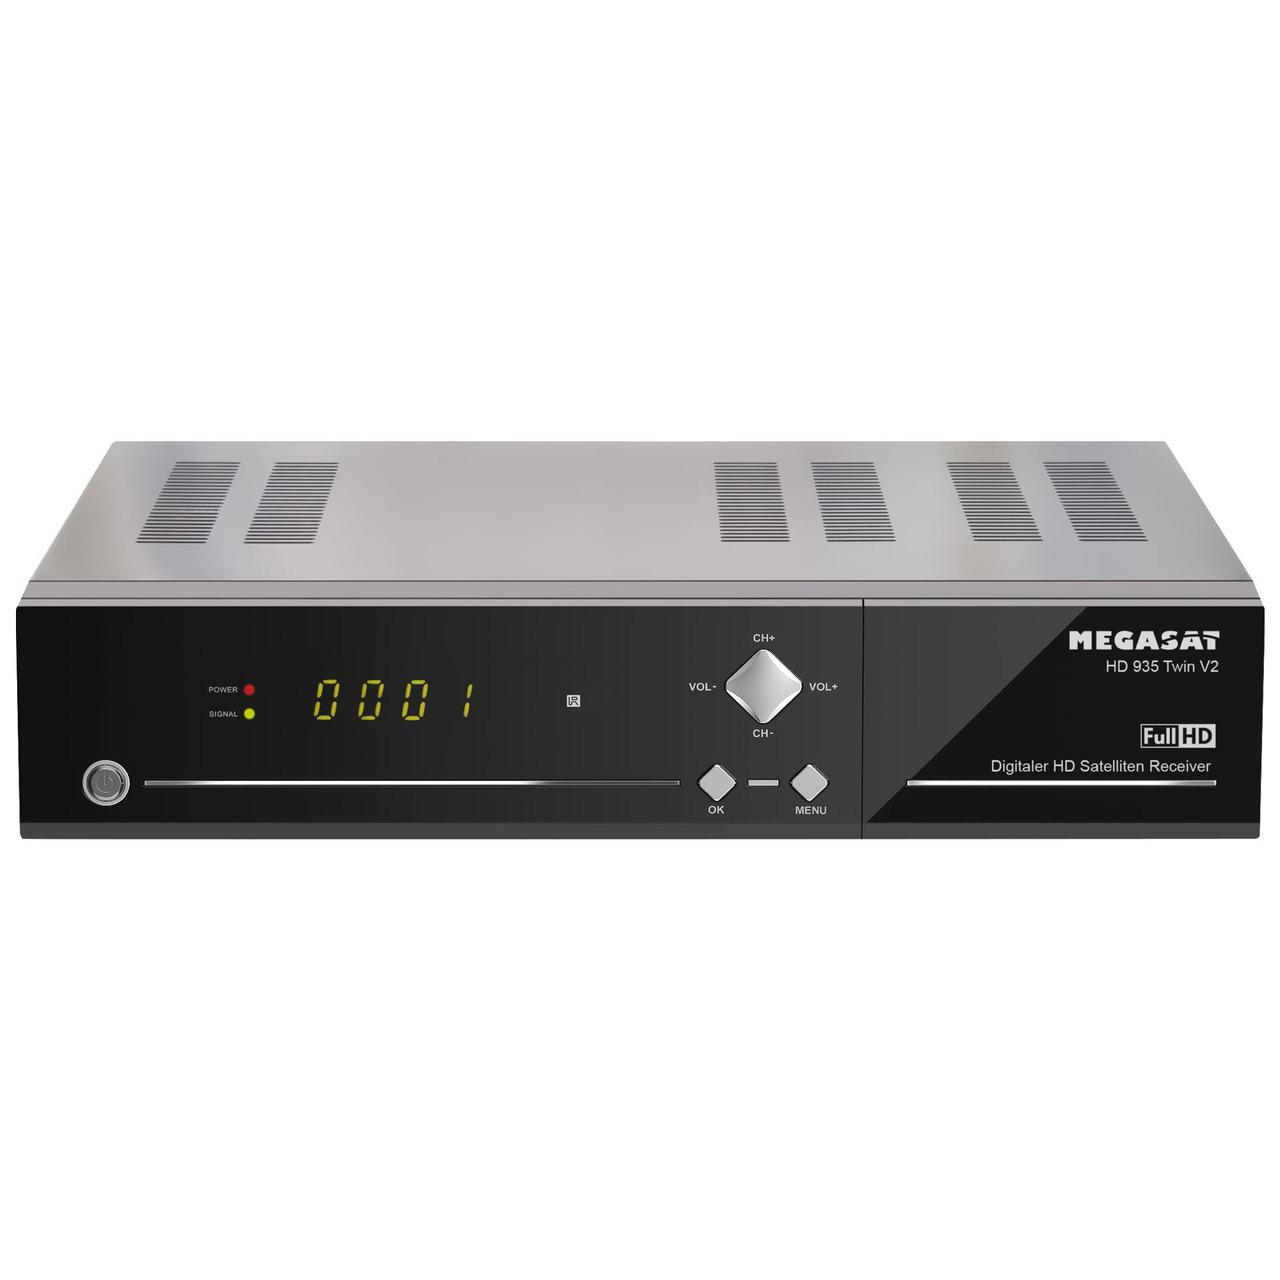 Megasat Twin-Sat-Receiver HD 935 Twin V2- mit 2-5undquot -Festplatteneinschub- 1080p-Full-HD- App-Steuerung